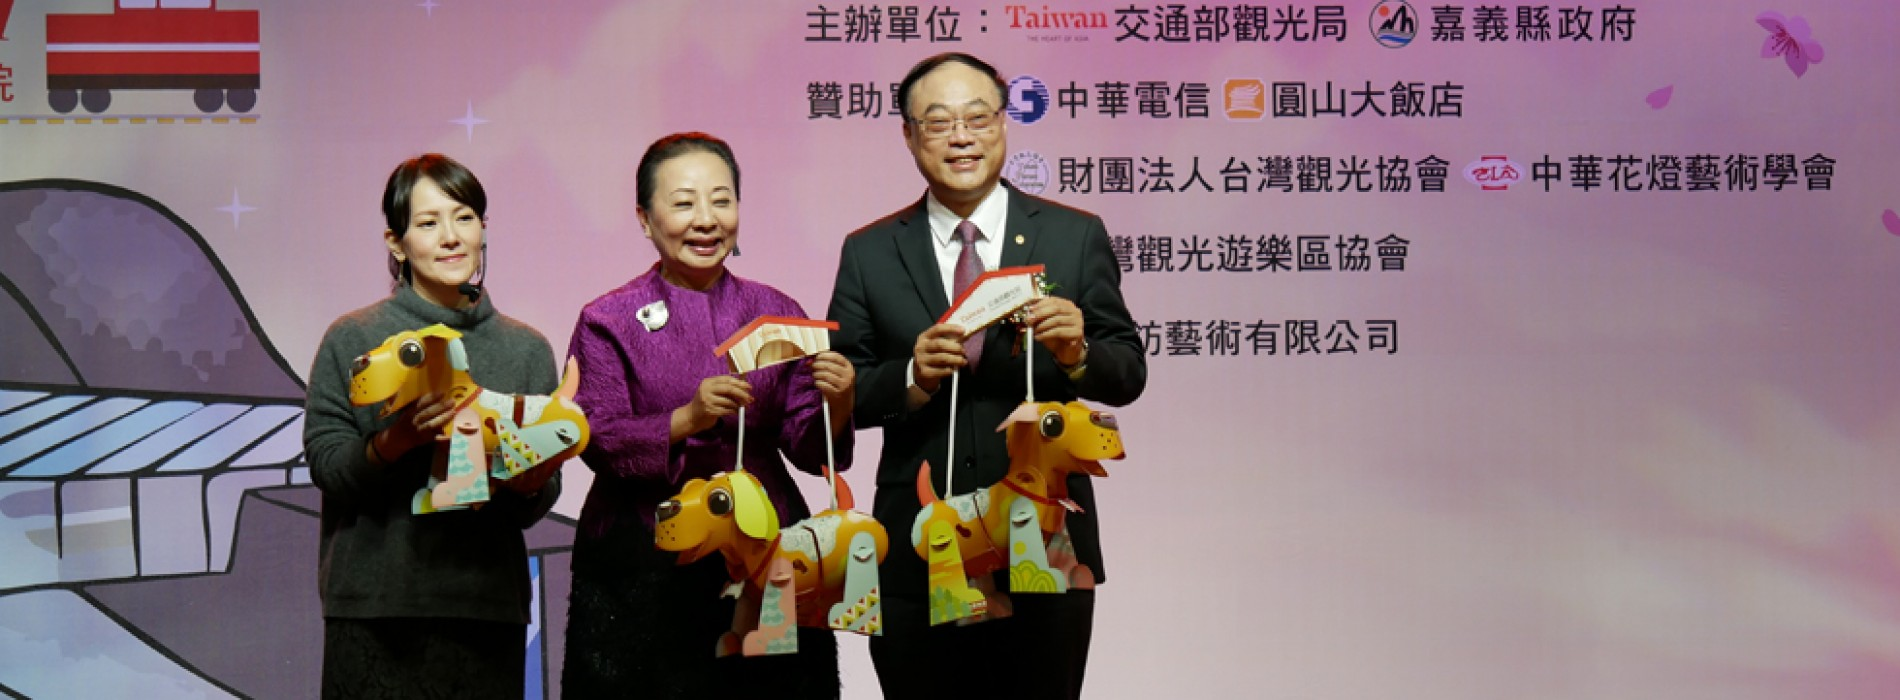 Lanterns released for Taiwan Lantern Festival 2018